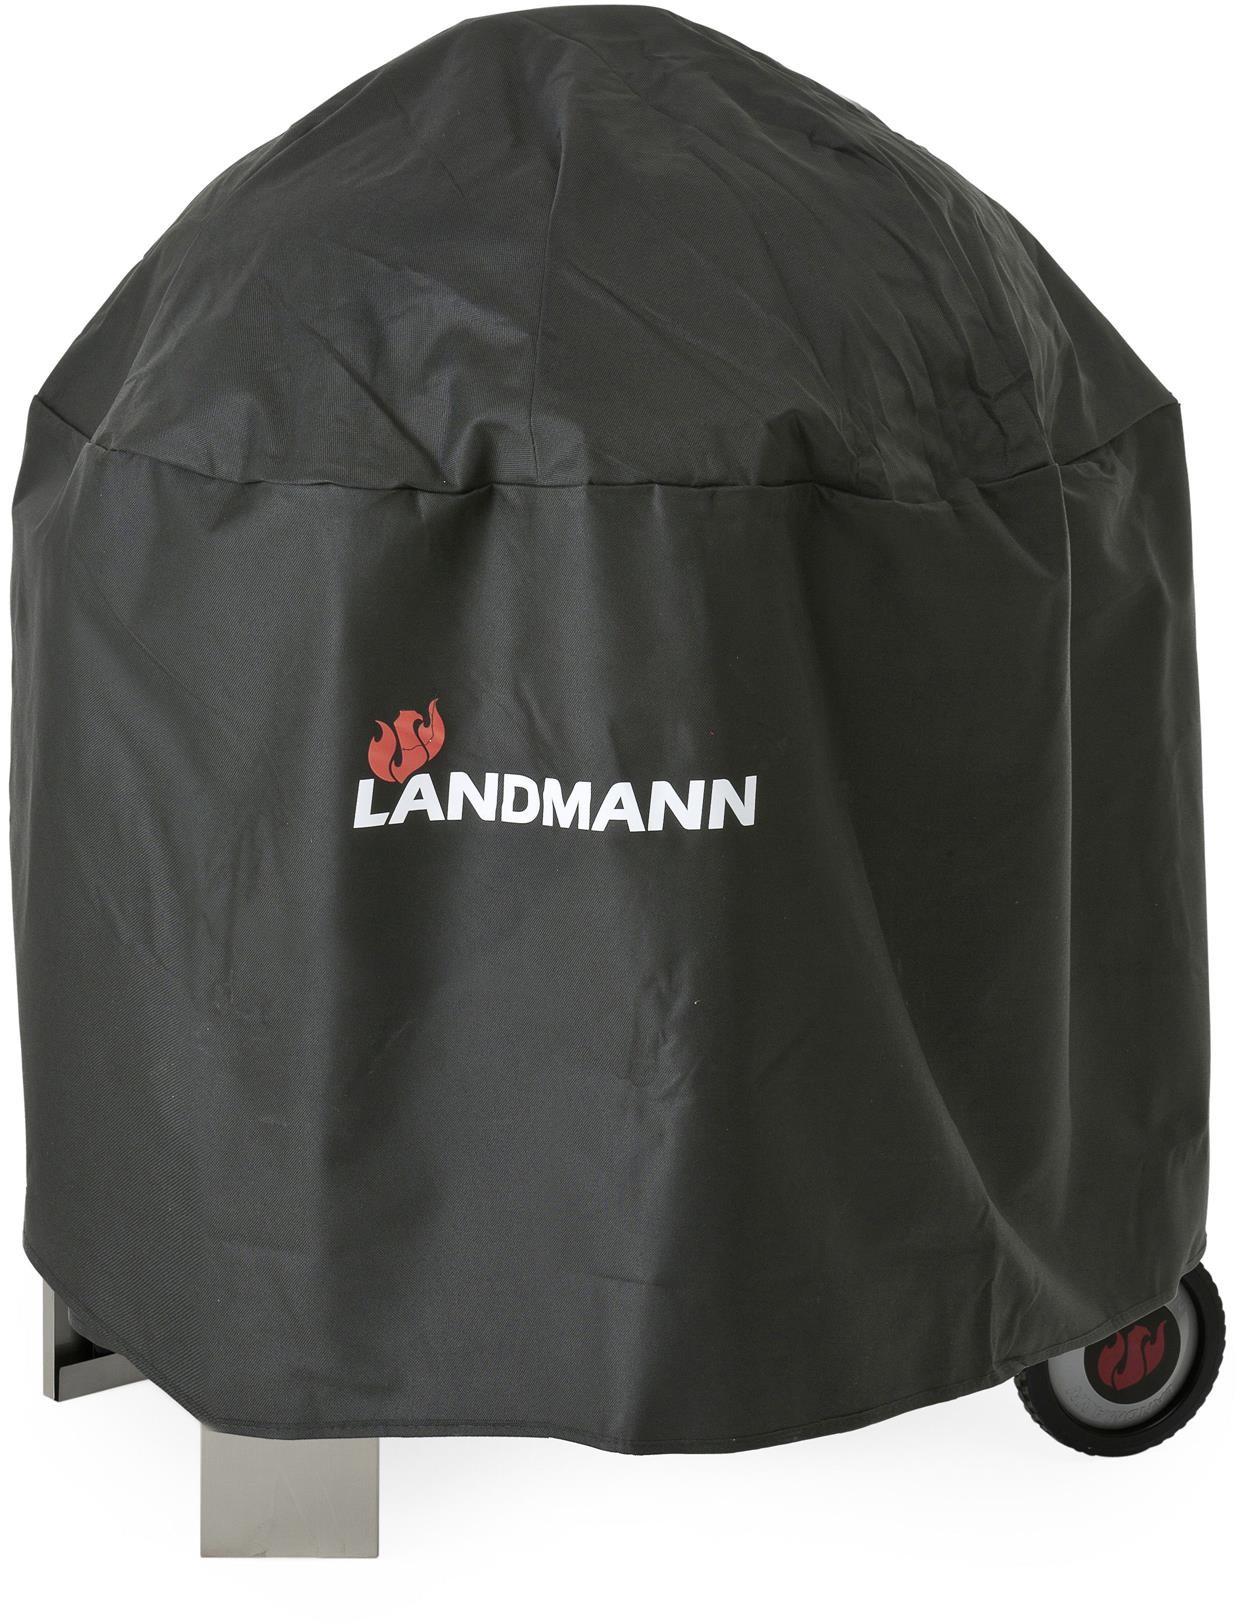 Landmann Pokrowiec na grille kuliste 14337